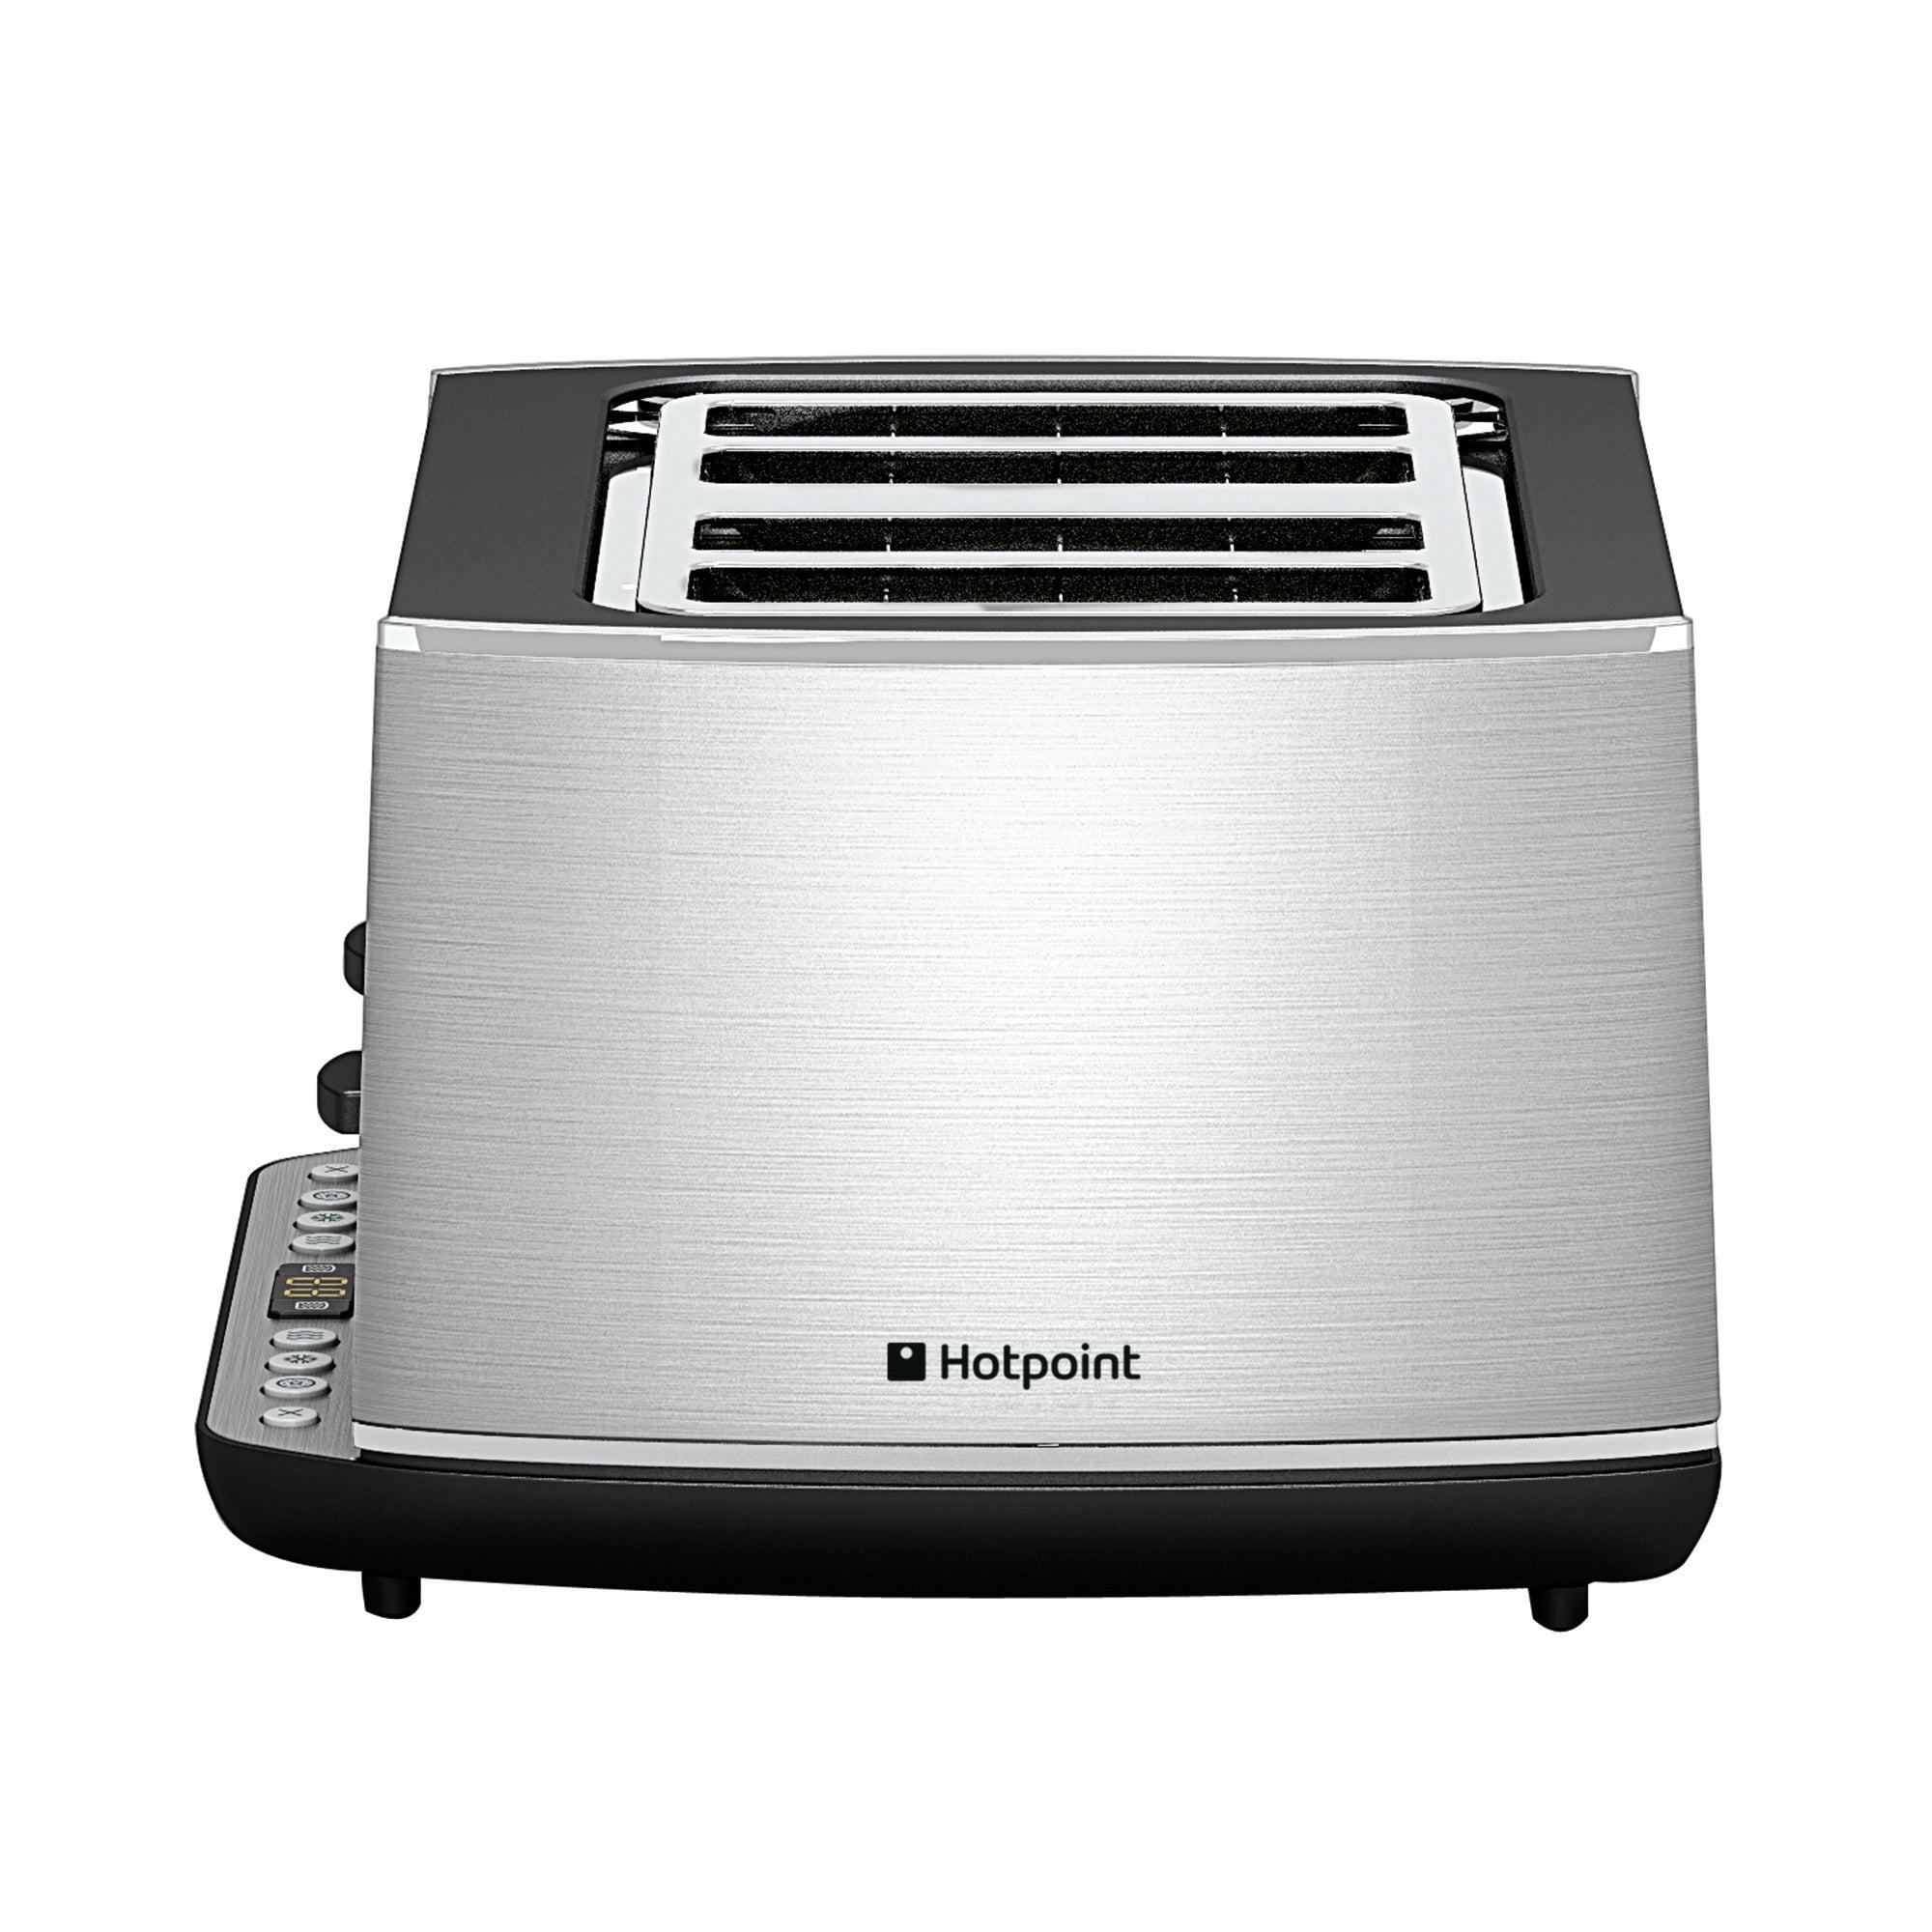 Hotpoint TT44EAXO Stainless Steel Silver 4 Slice Digital Toaster